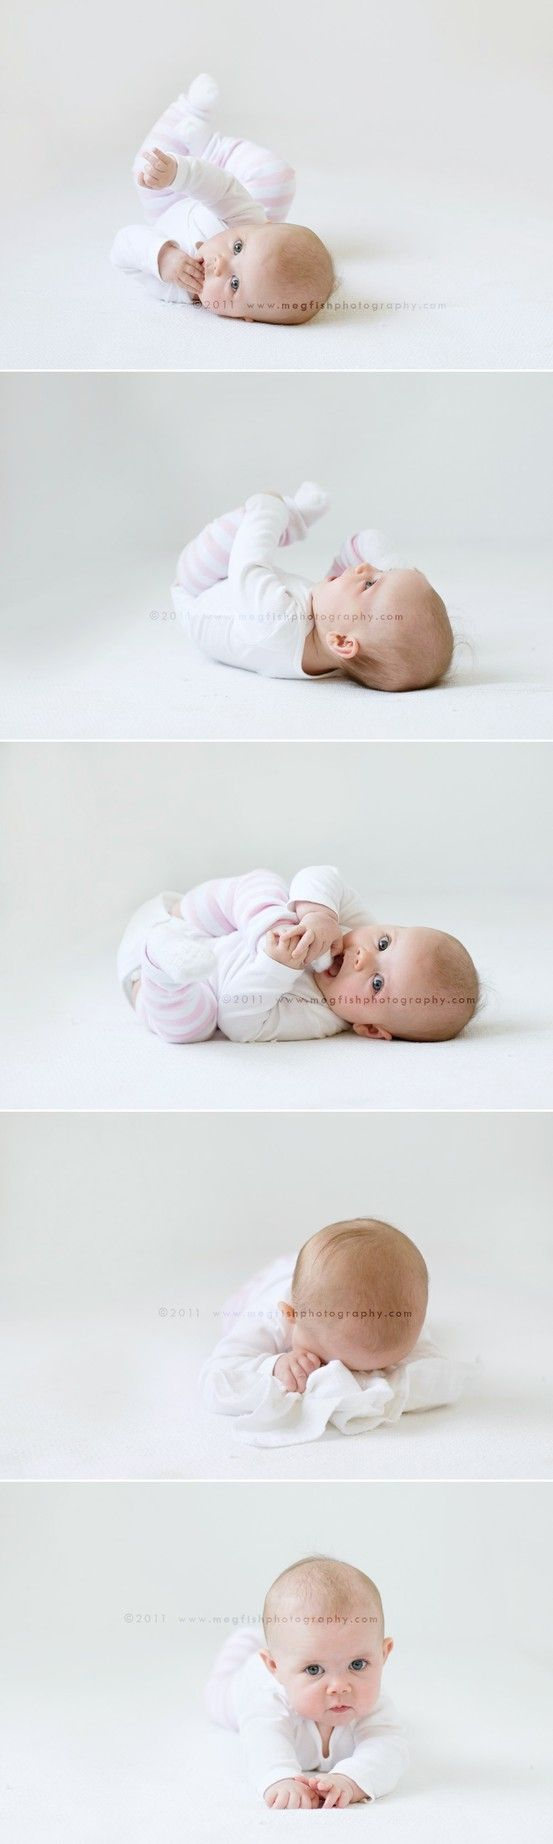 awww i love babies